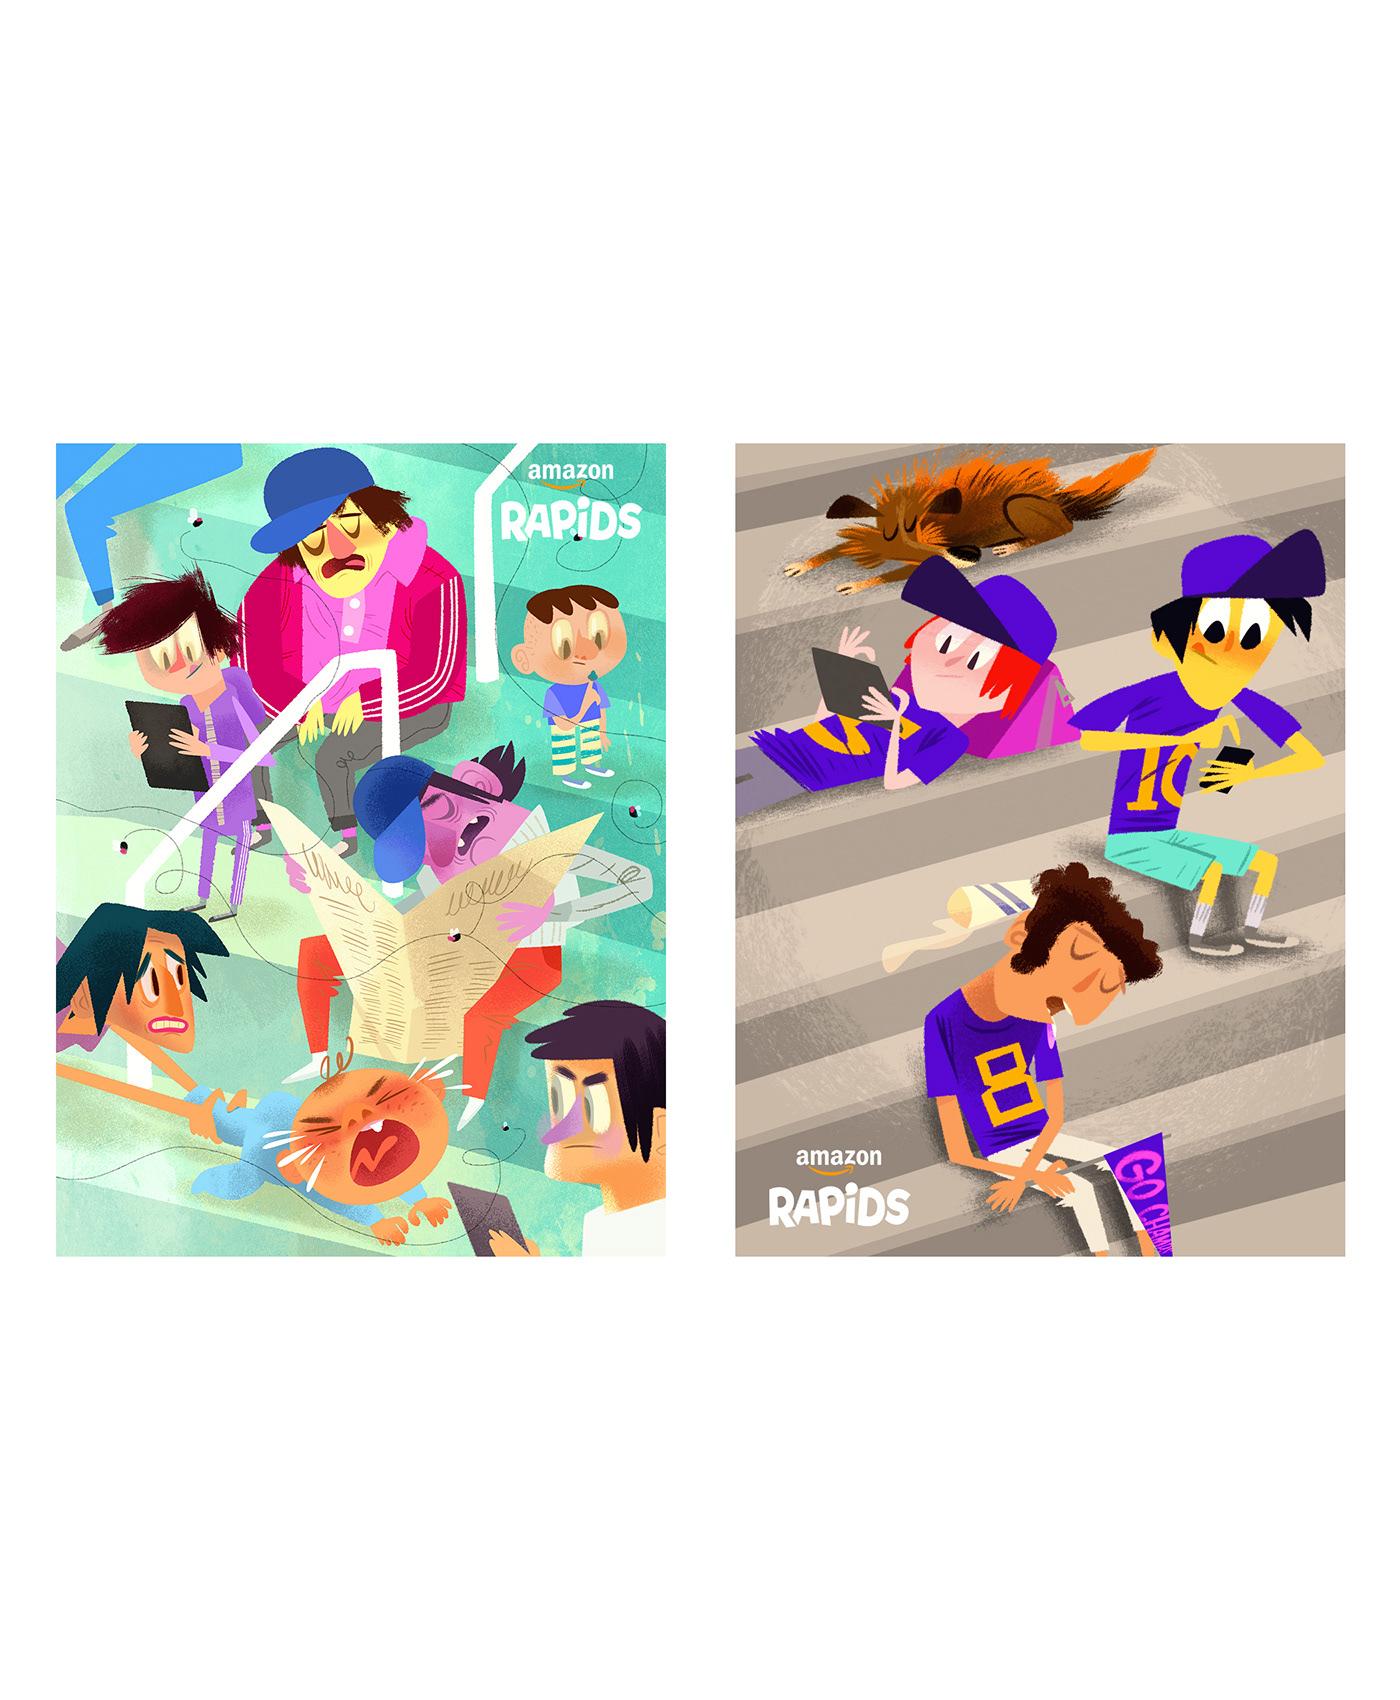 Amazon animationcharacters CharactersDesign DigitalIllustration e-book e-reader Fun shortstories sports Sportsillustration